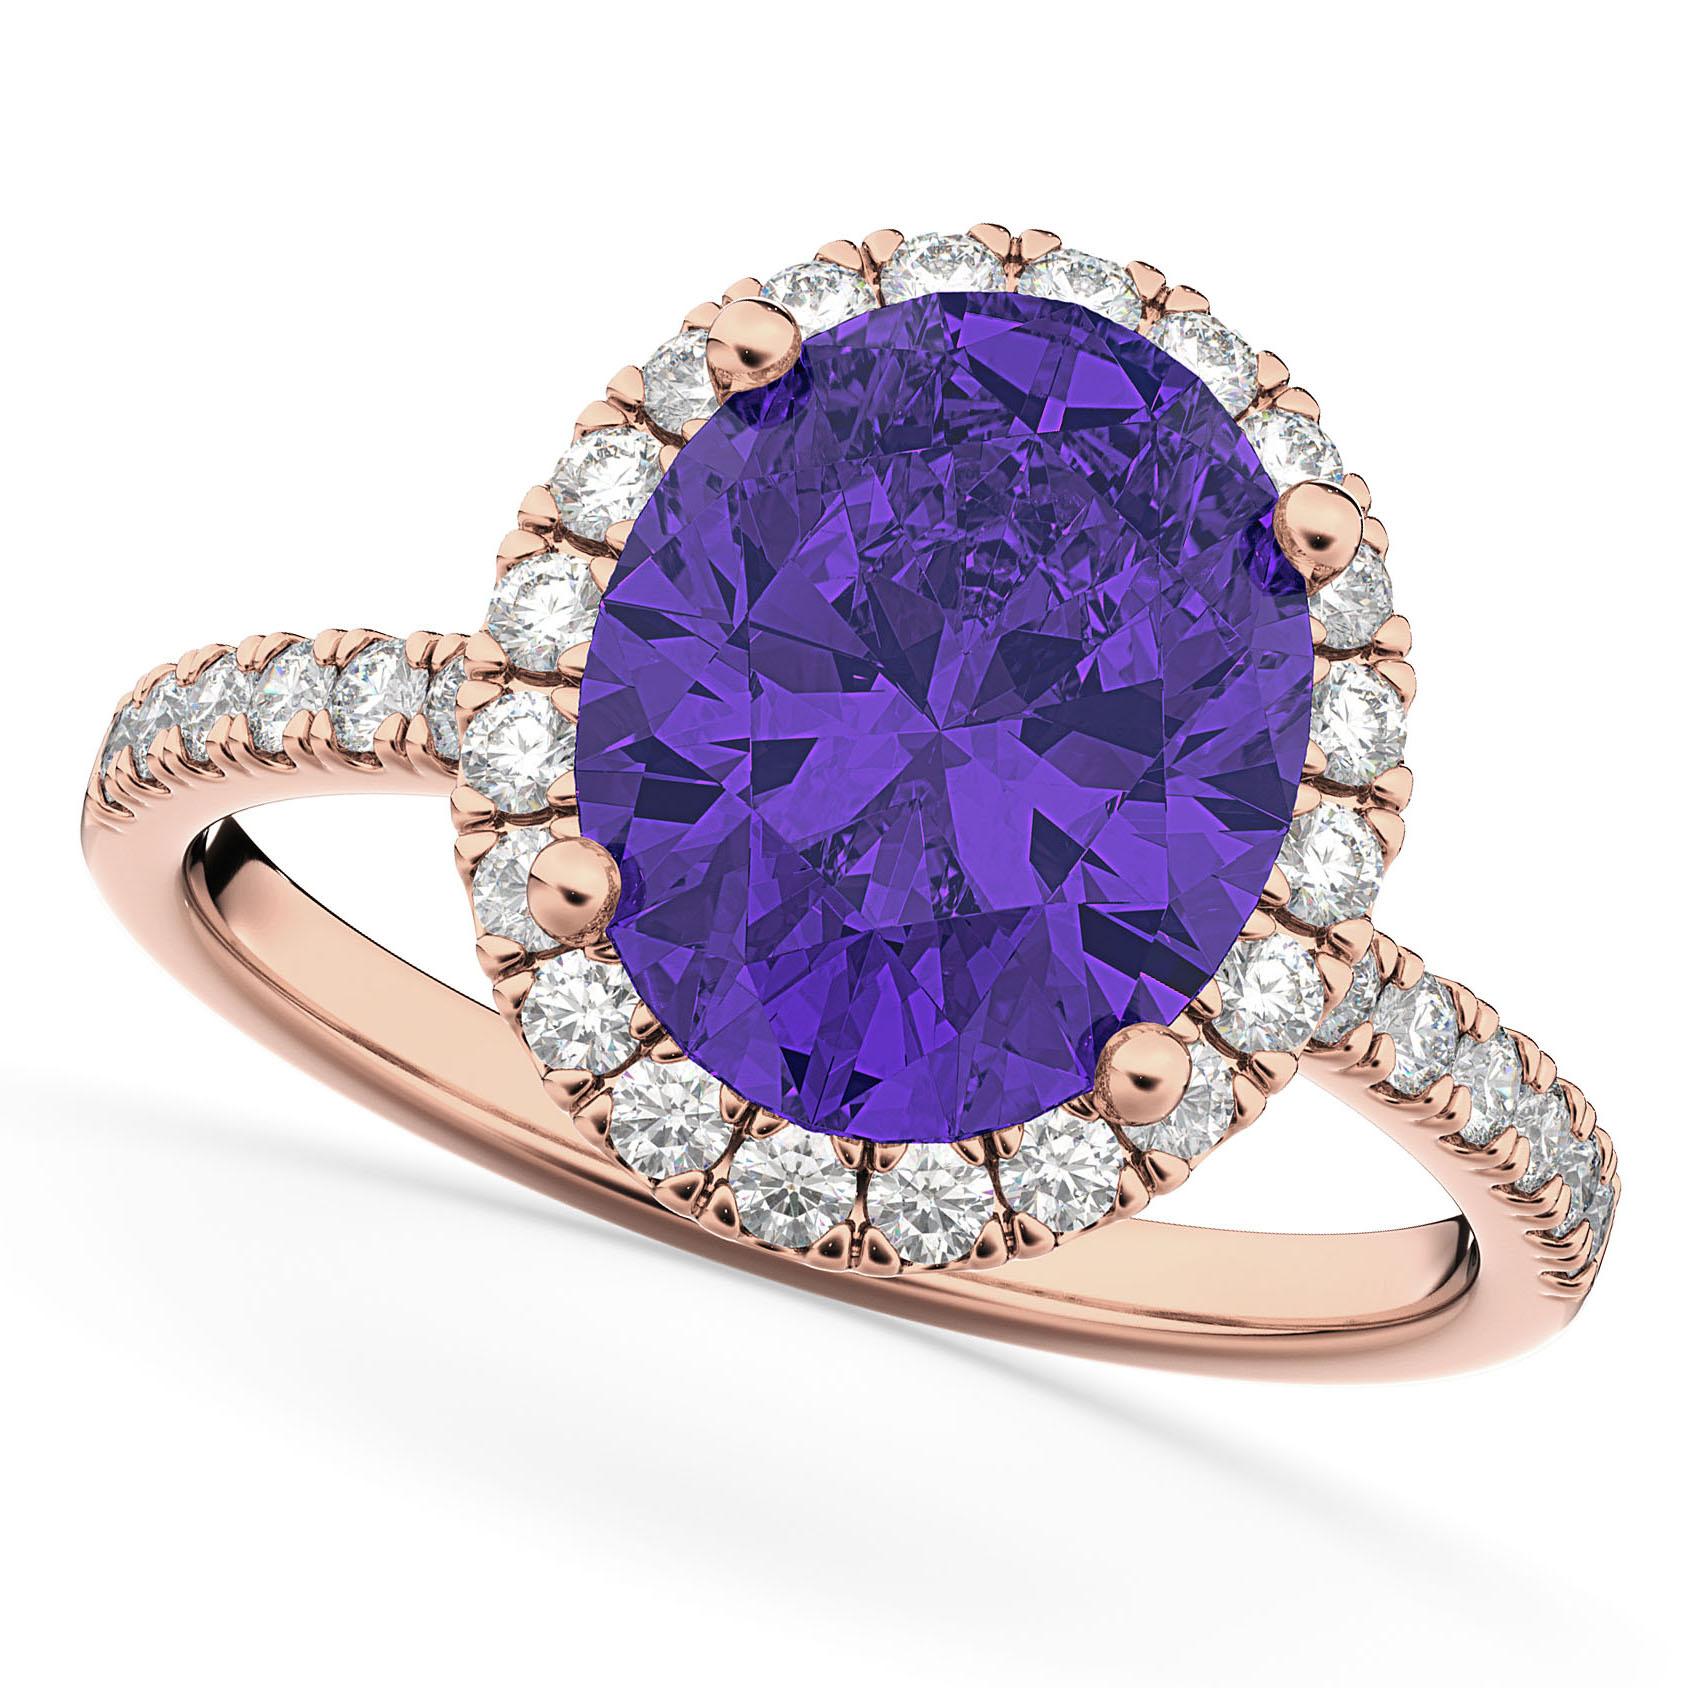 Oval Cut Halo Tanzanite & Diamond Engagement Ring 14K Rose Gold 3.66ct